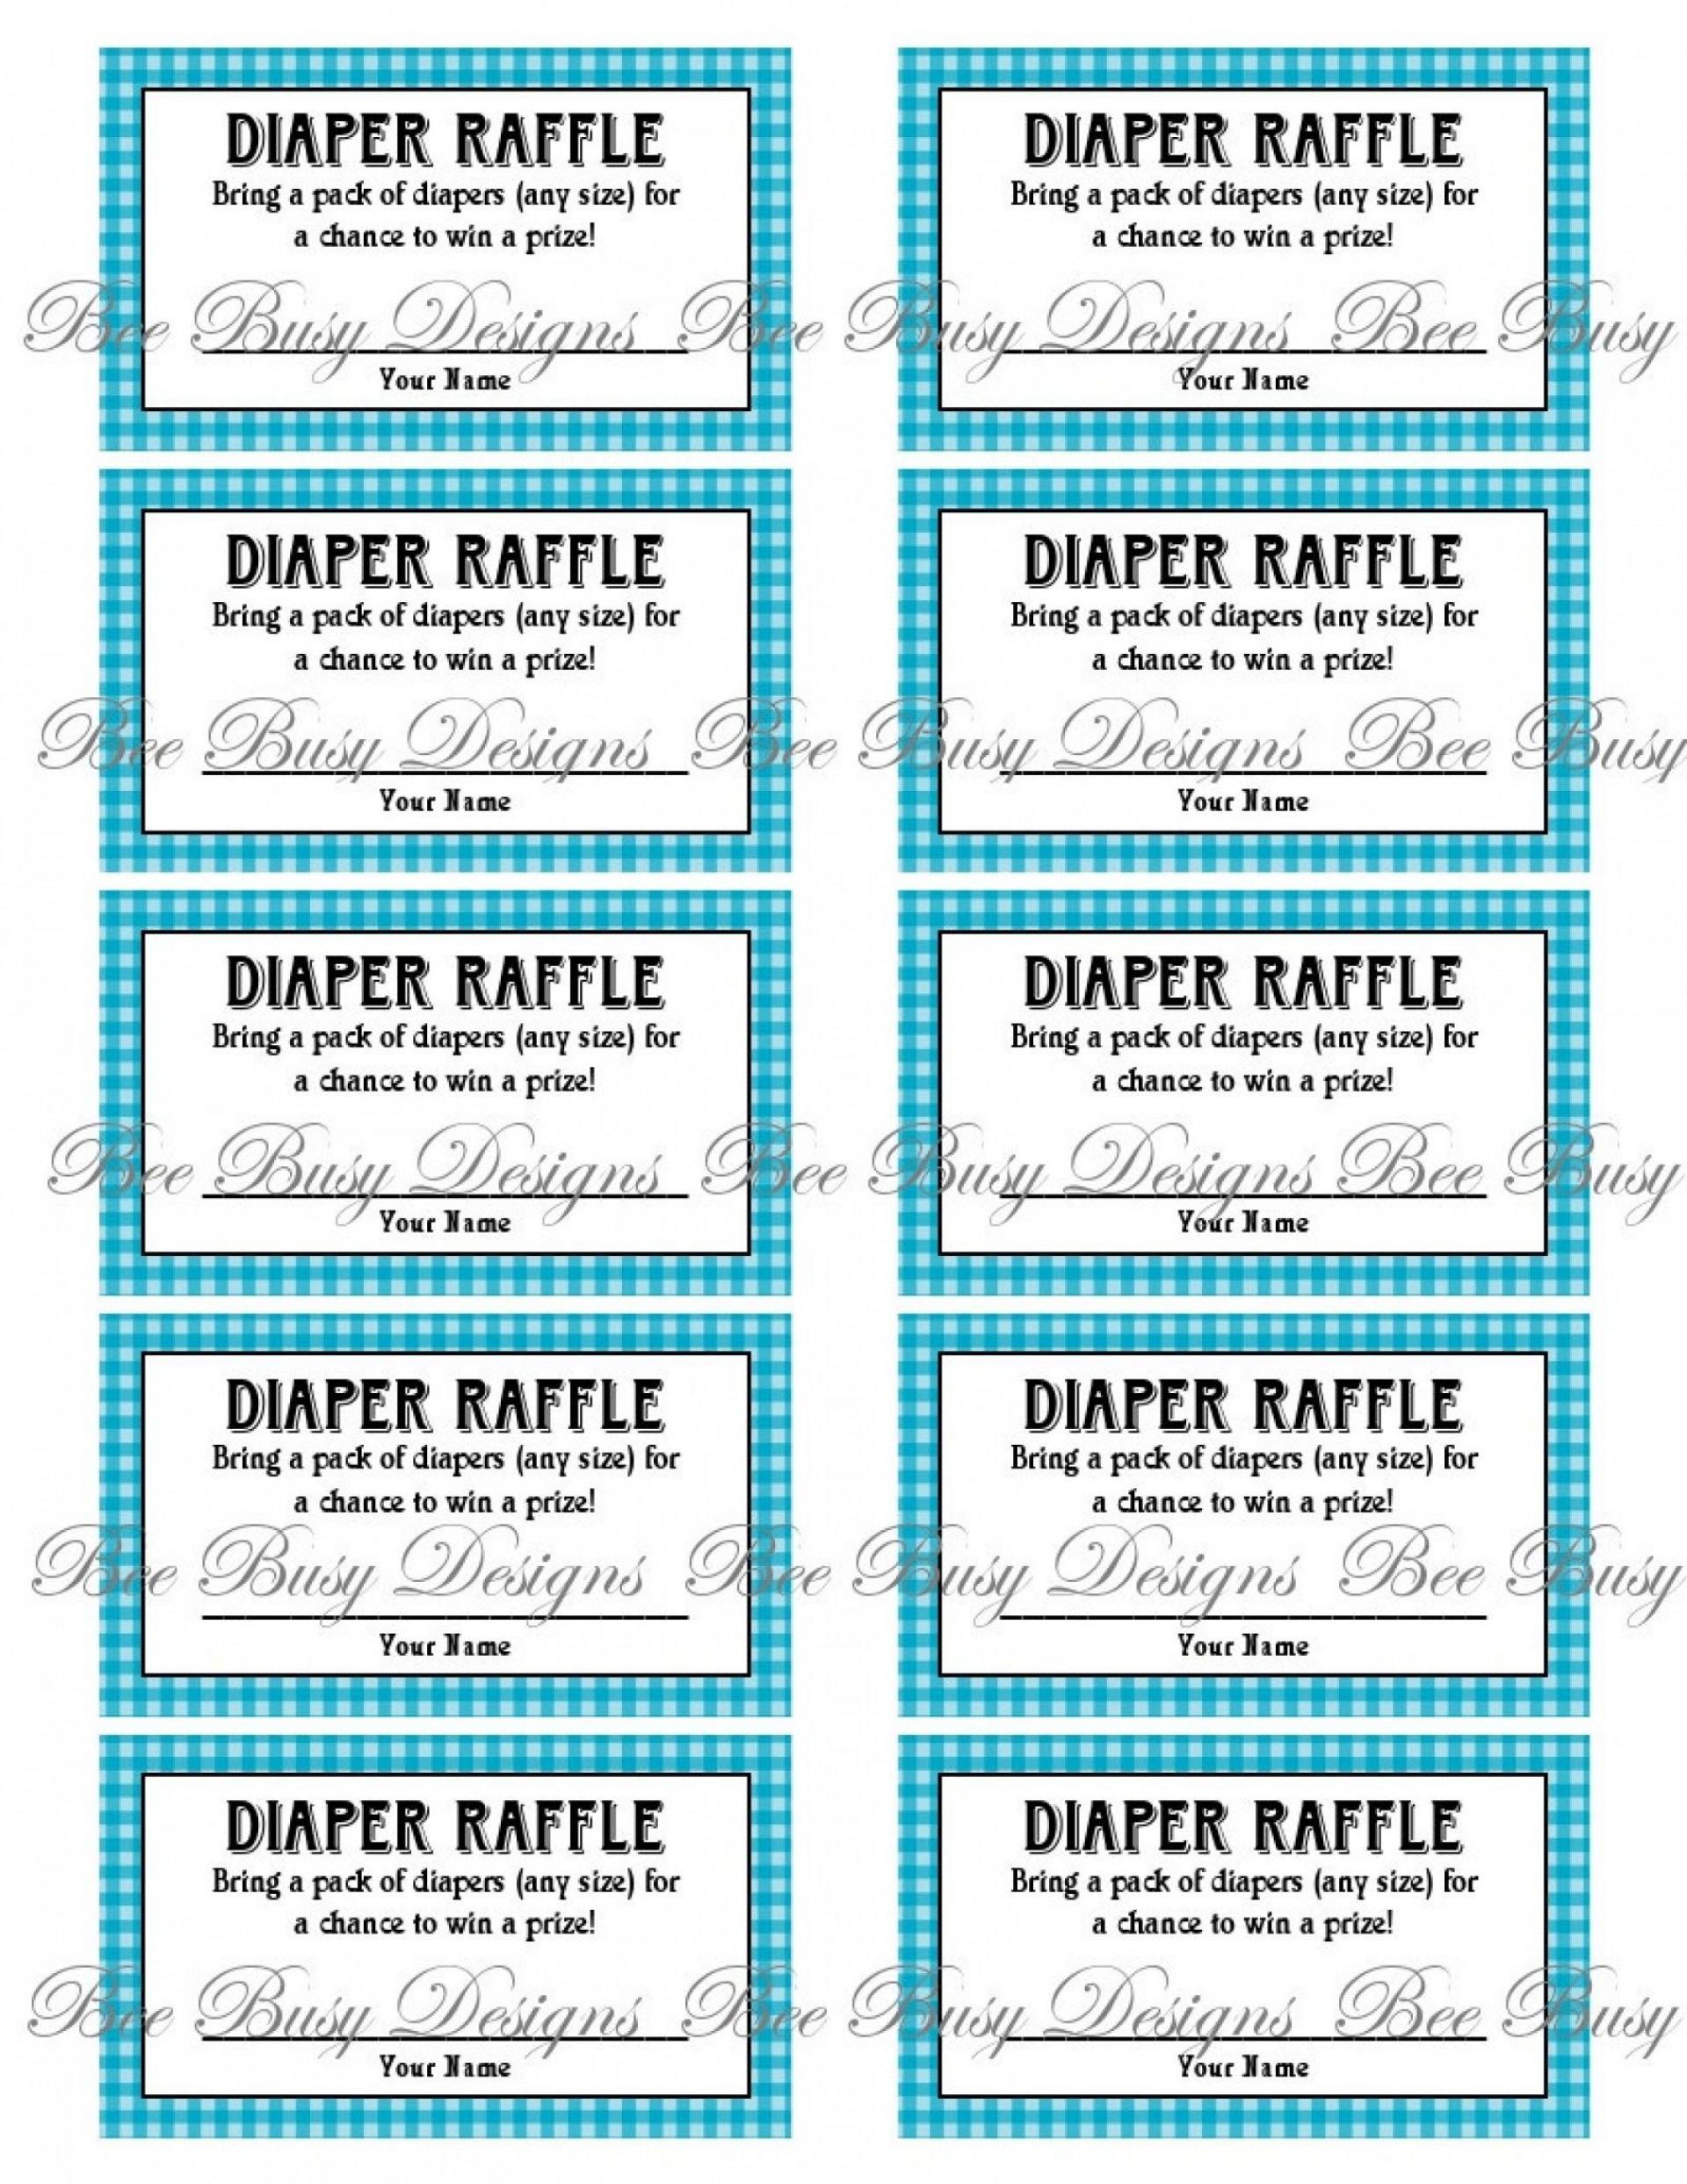 009 Astounding Diaper Raffle Ticket Template High Resolution  Boy Free Printable Print Black And White1920